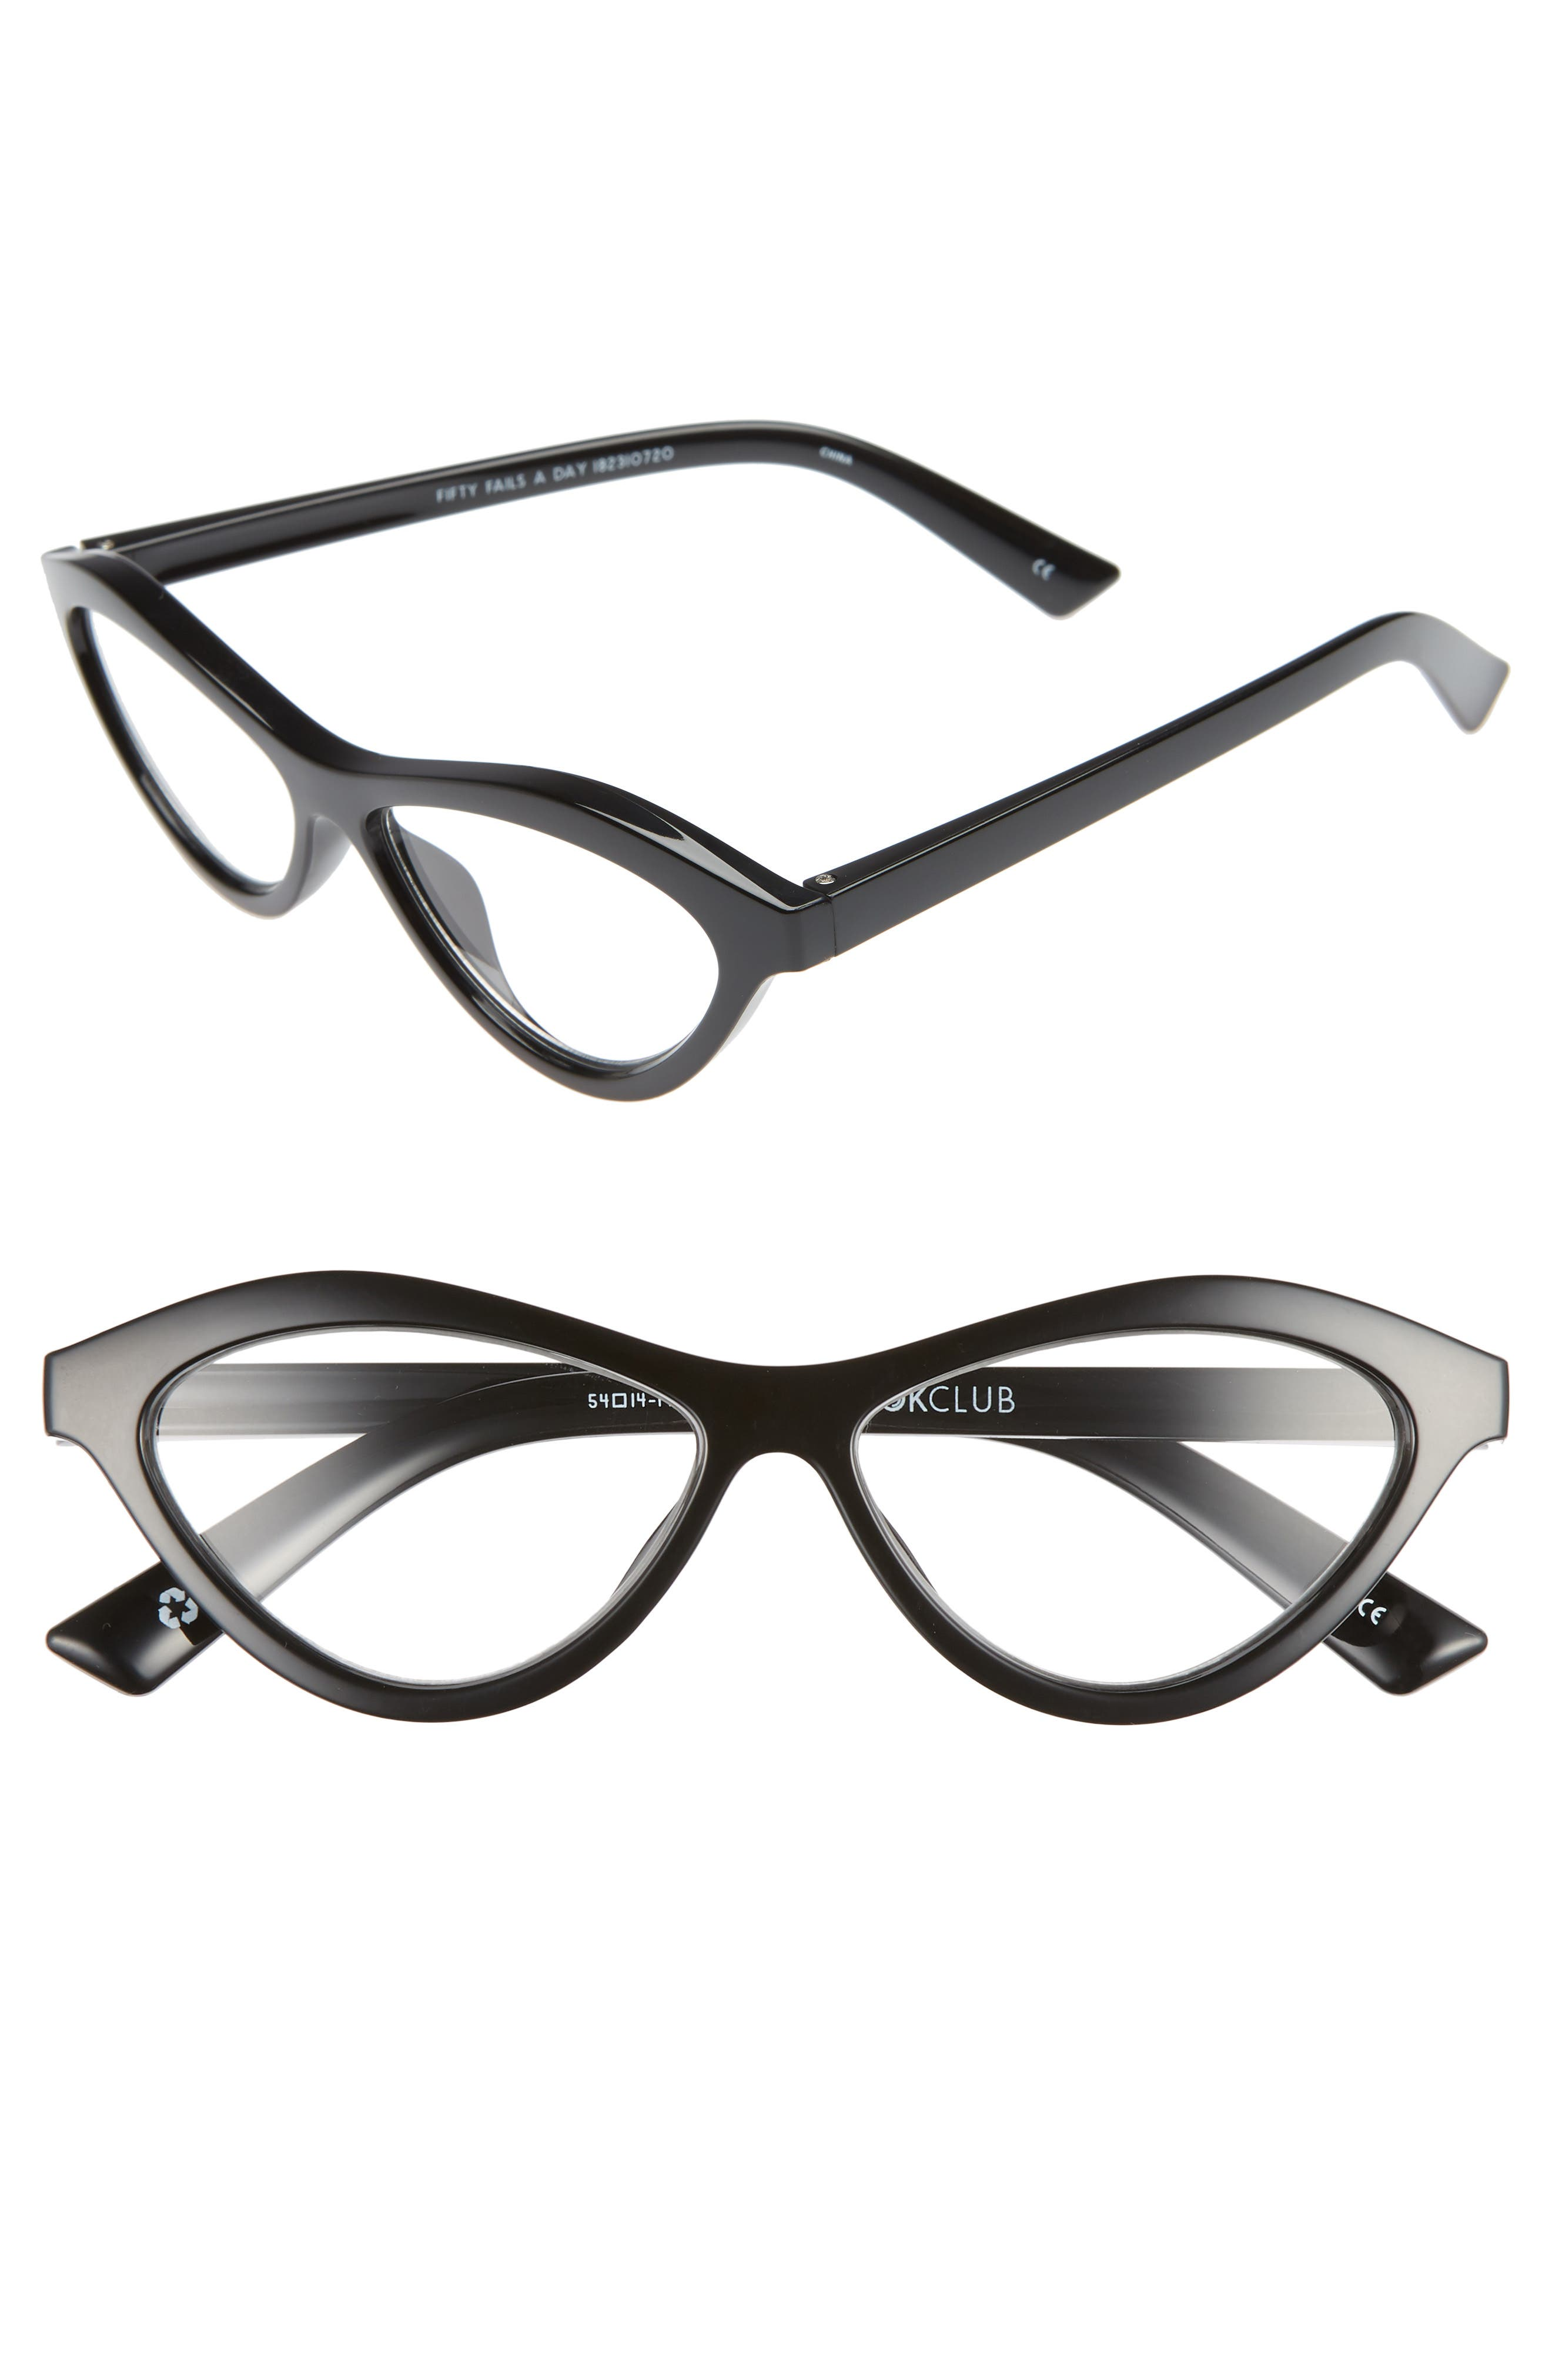 Retro Sunglasses | Vintage Glasses | New Vintage Eyeglasses Womens The Bookclub Fifty Fails A Day 54Mm Reading Glasses - Black Marker $30.00 AT vintagedancer.com